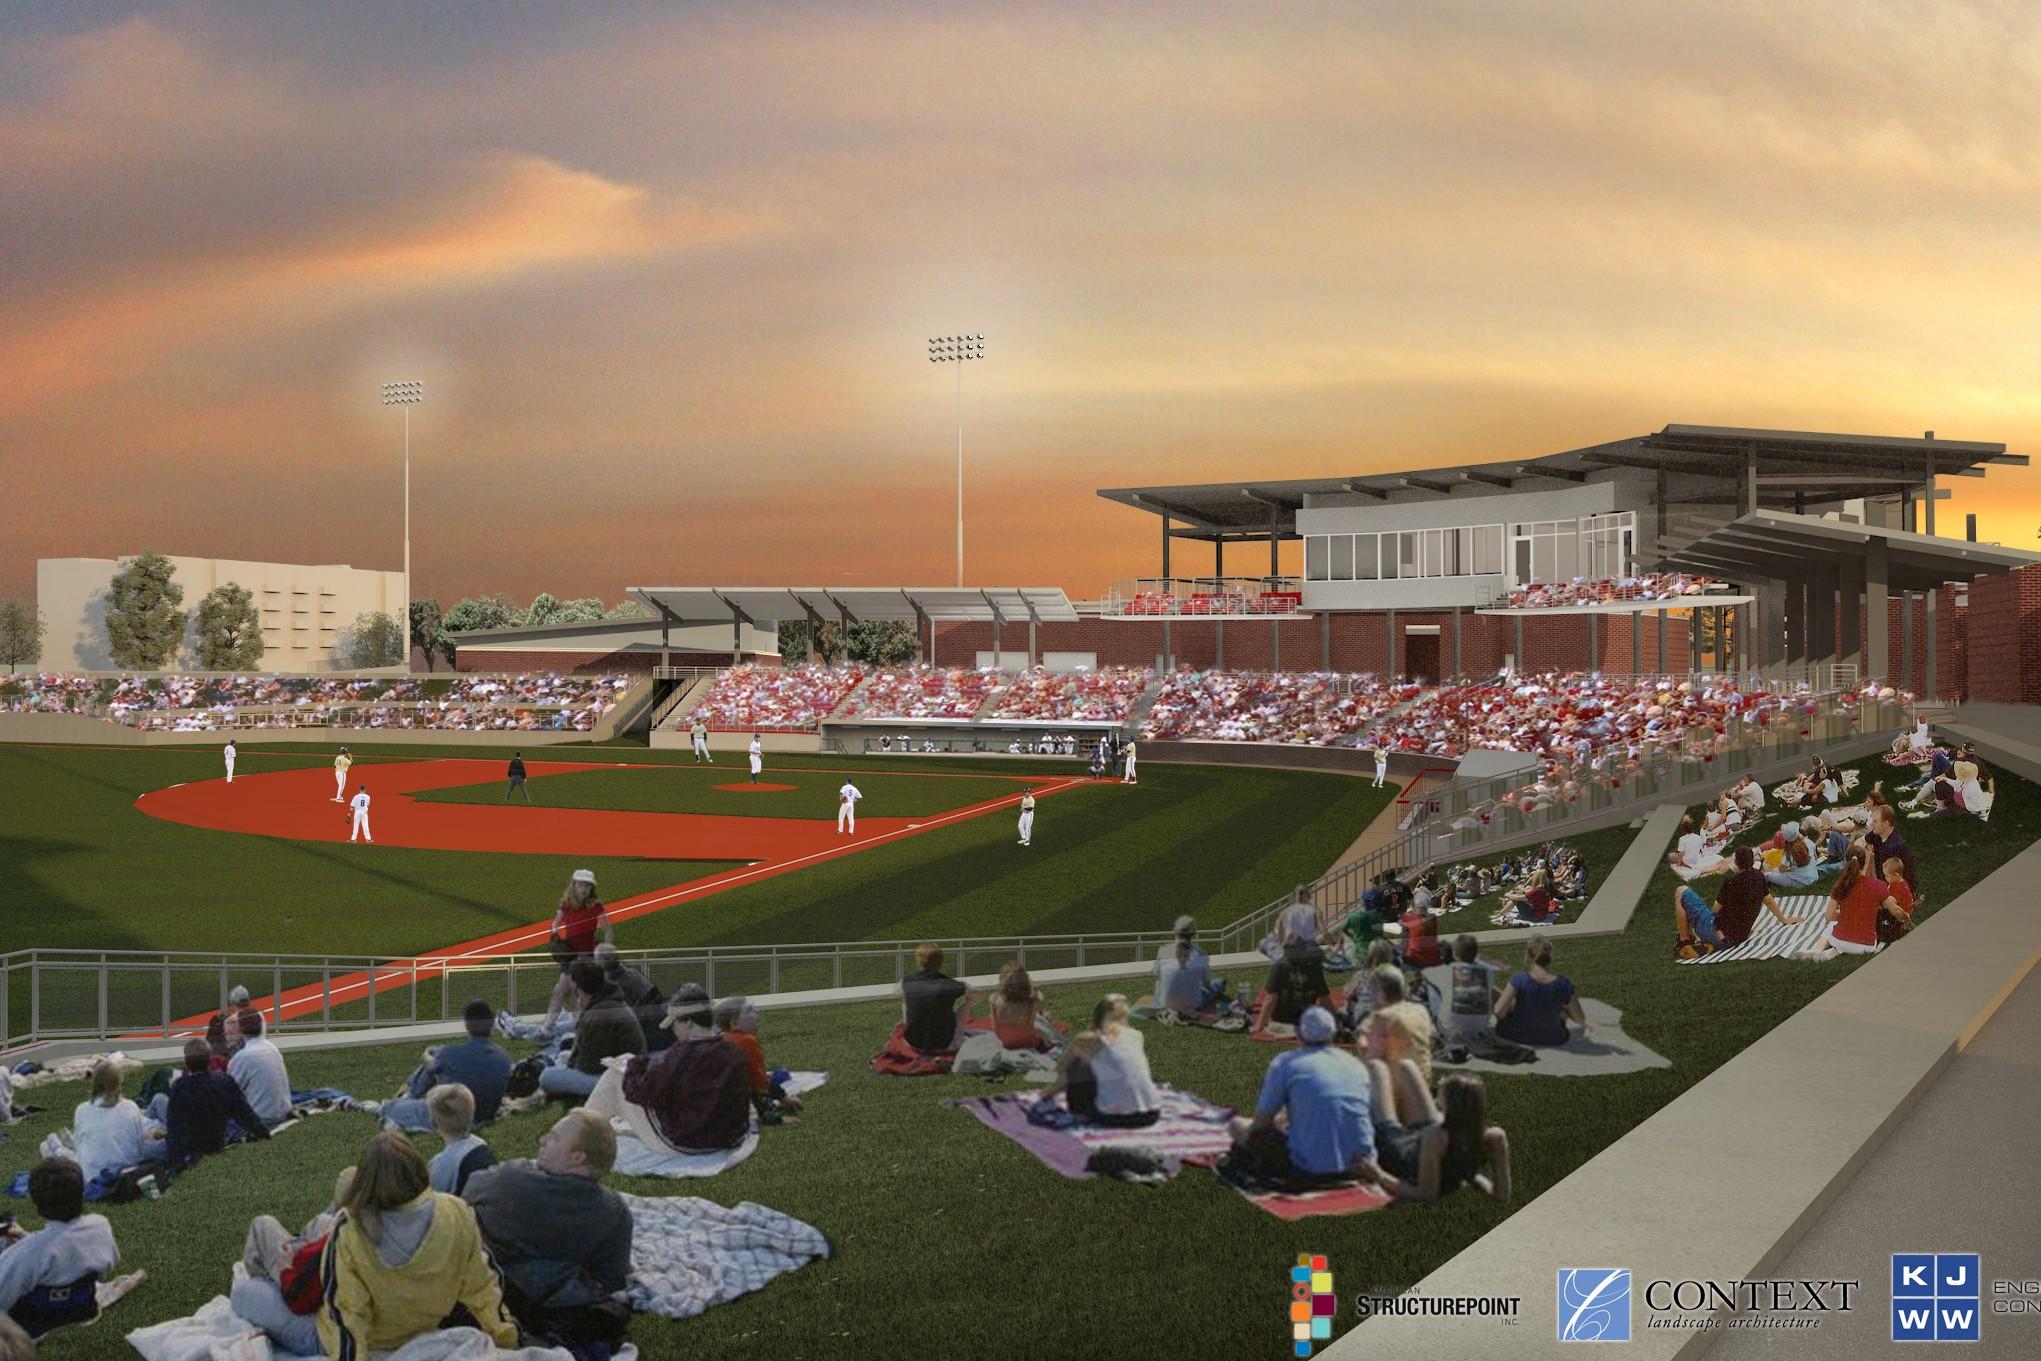 Kokomo Baseball stadium artist rendering